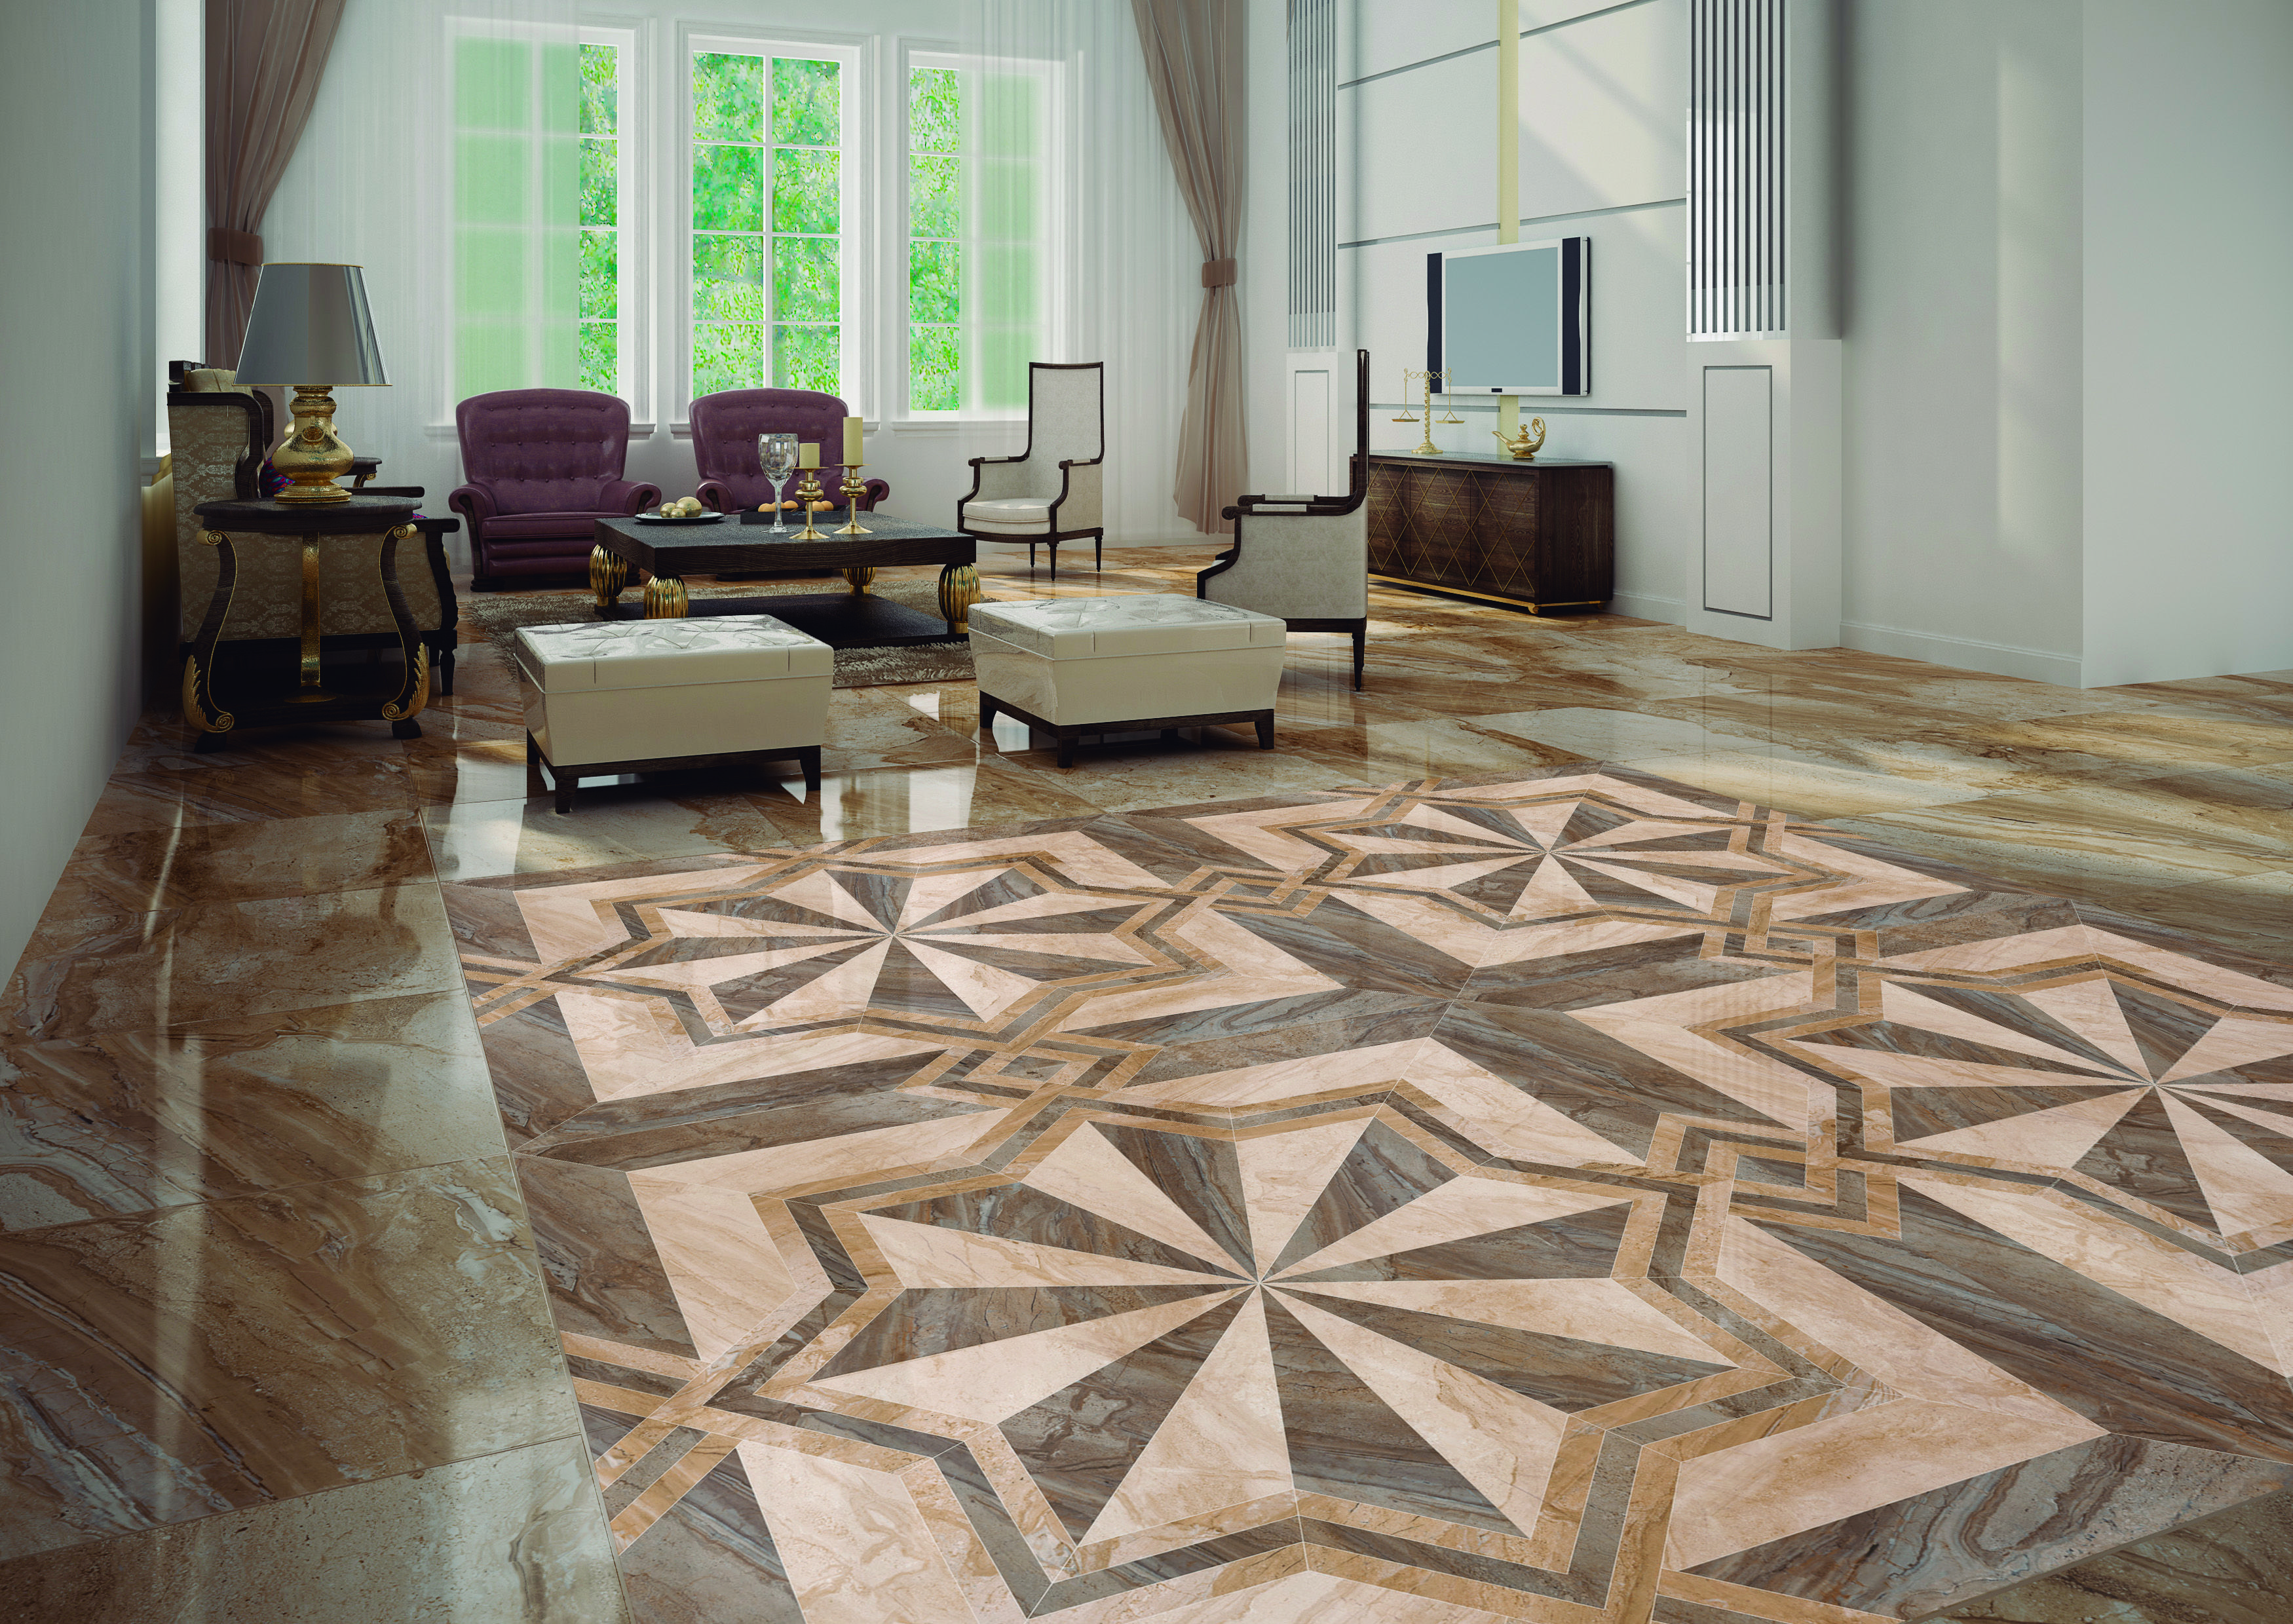 Umbria Multicolour Patterned Marble Effect Floor Tile Floor